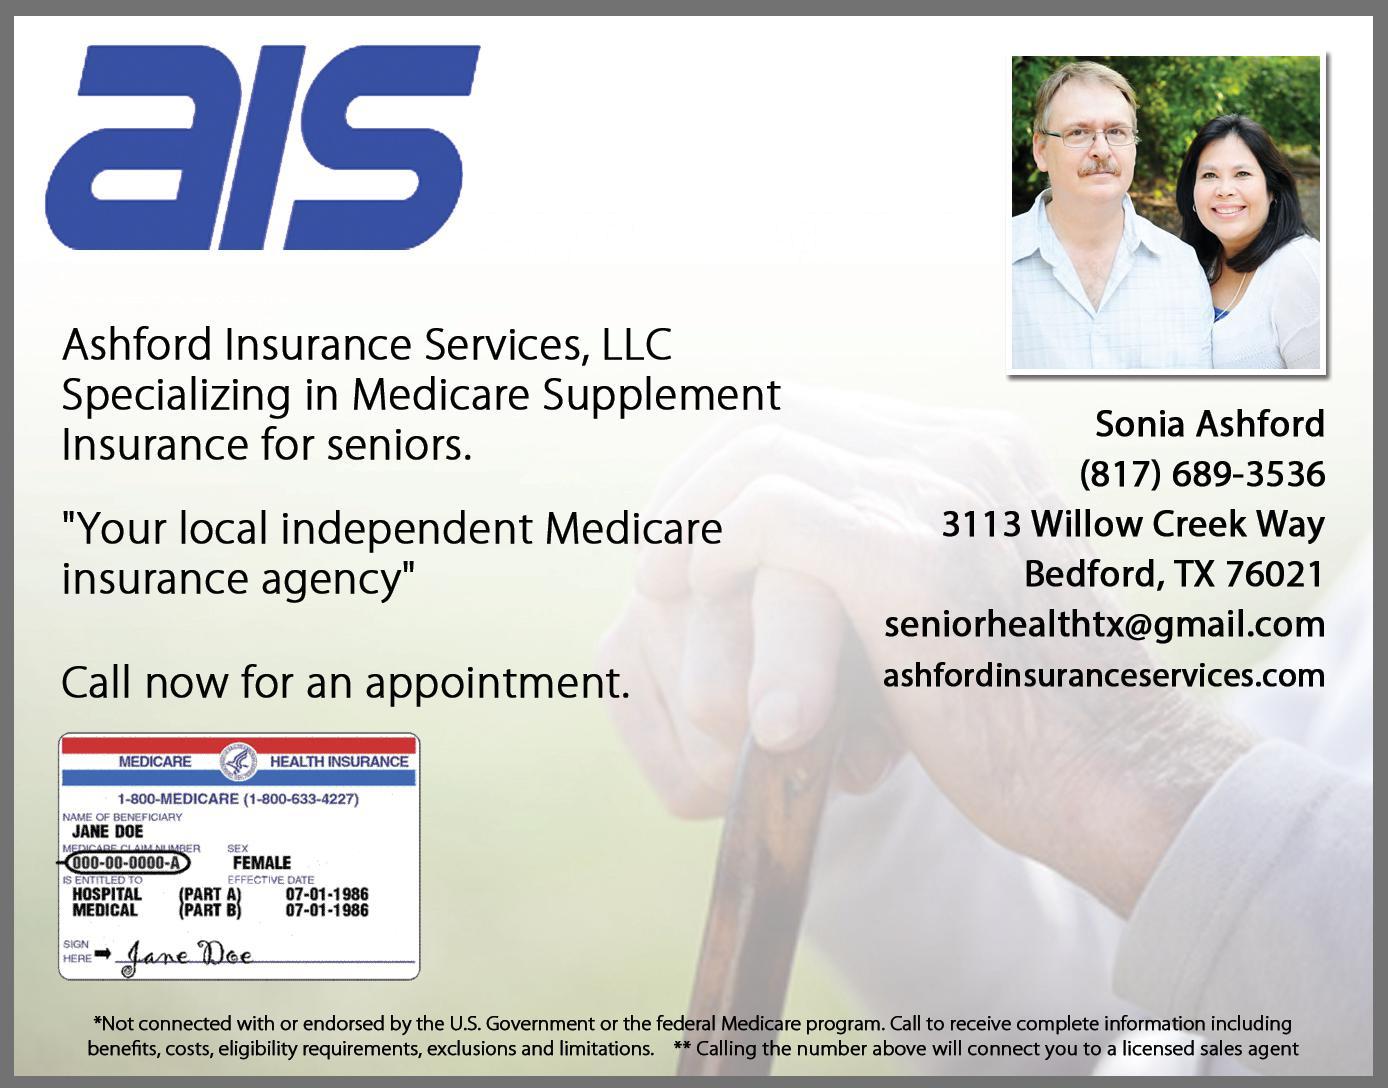 Ashford Insurance Services, LLC